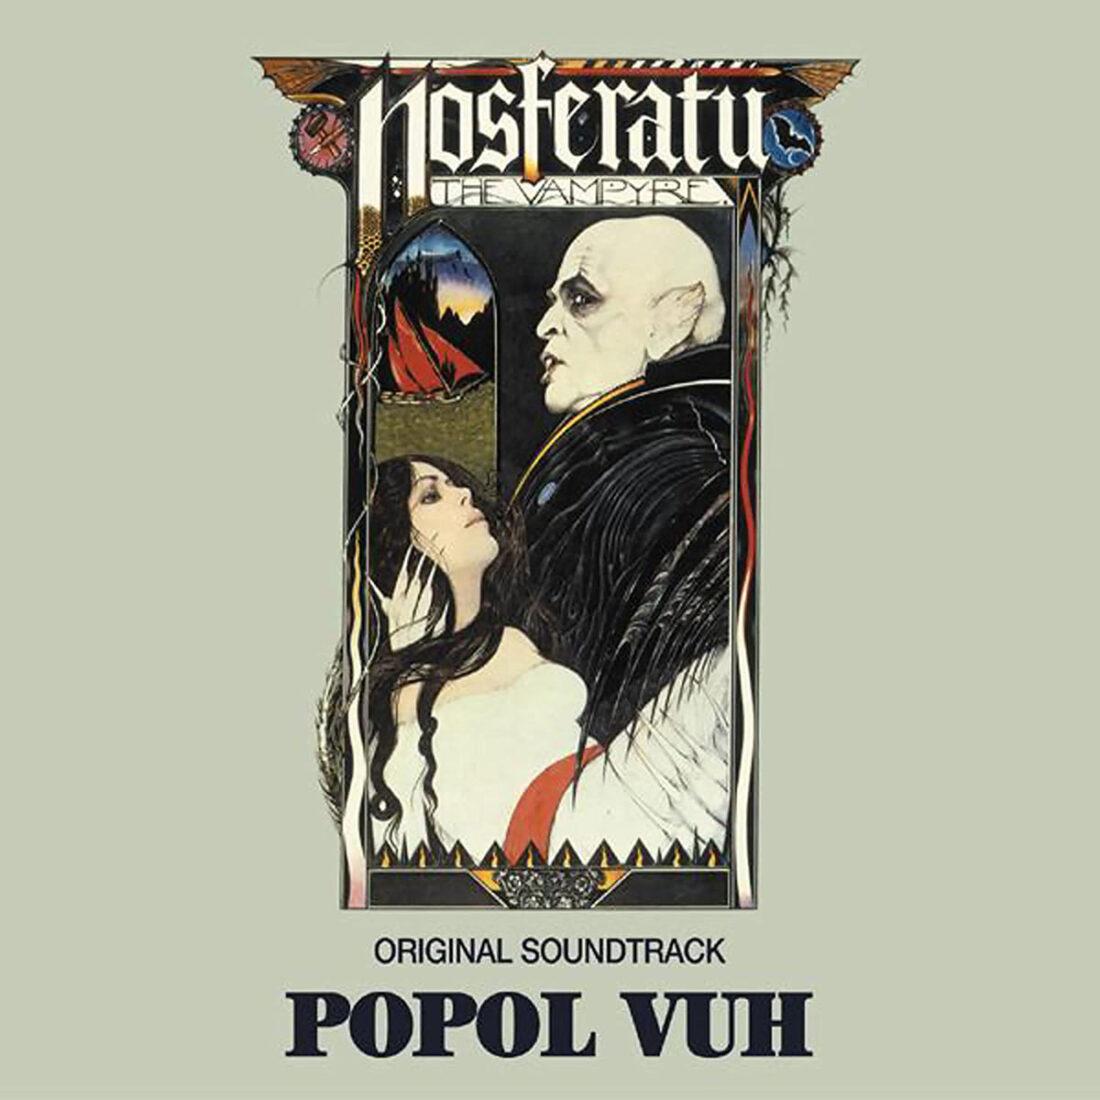 Nosferatu the Vampyre Remastered Film Soundtrack CD Popol Vuh, Werner Herzog